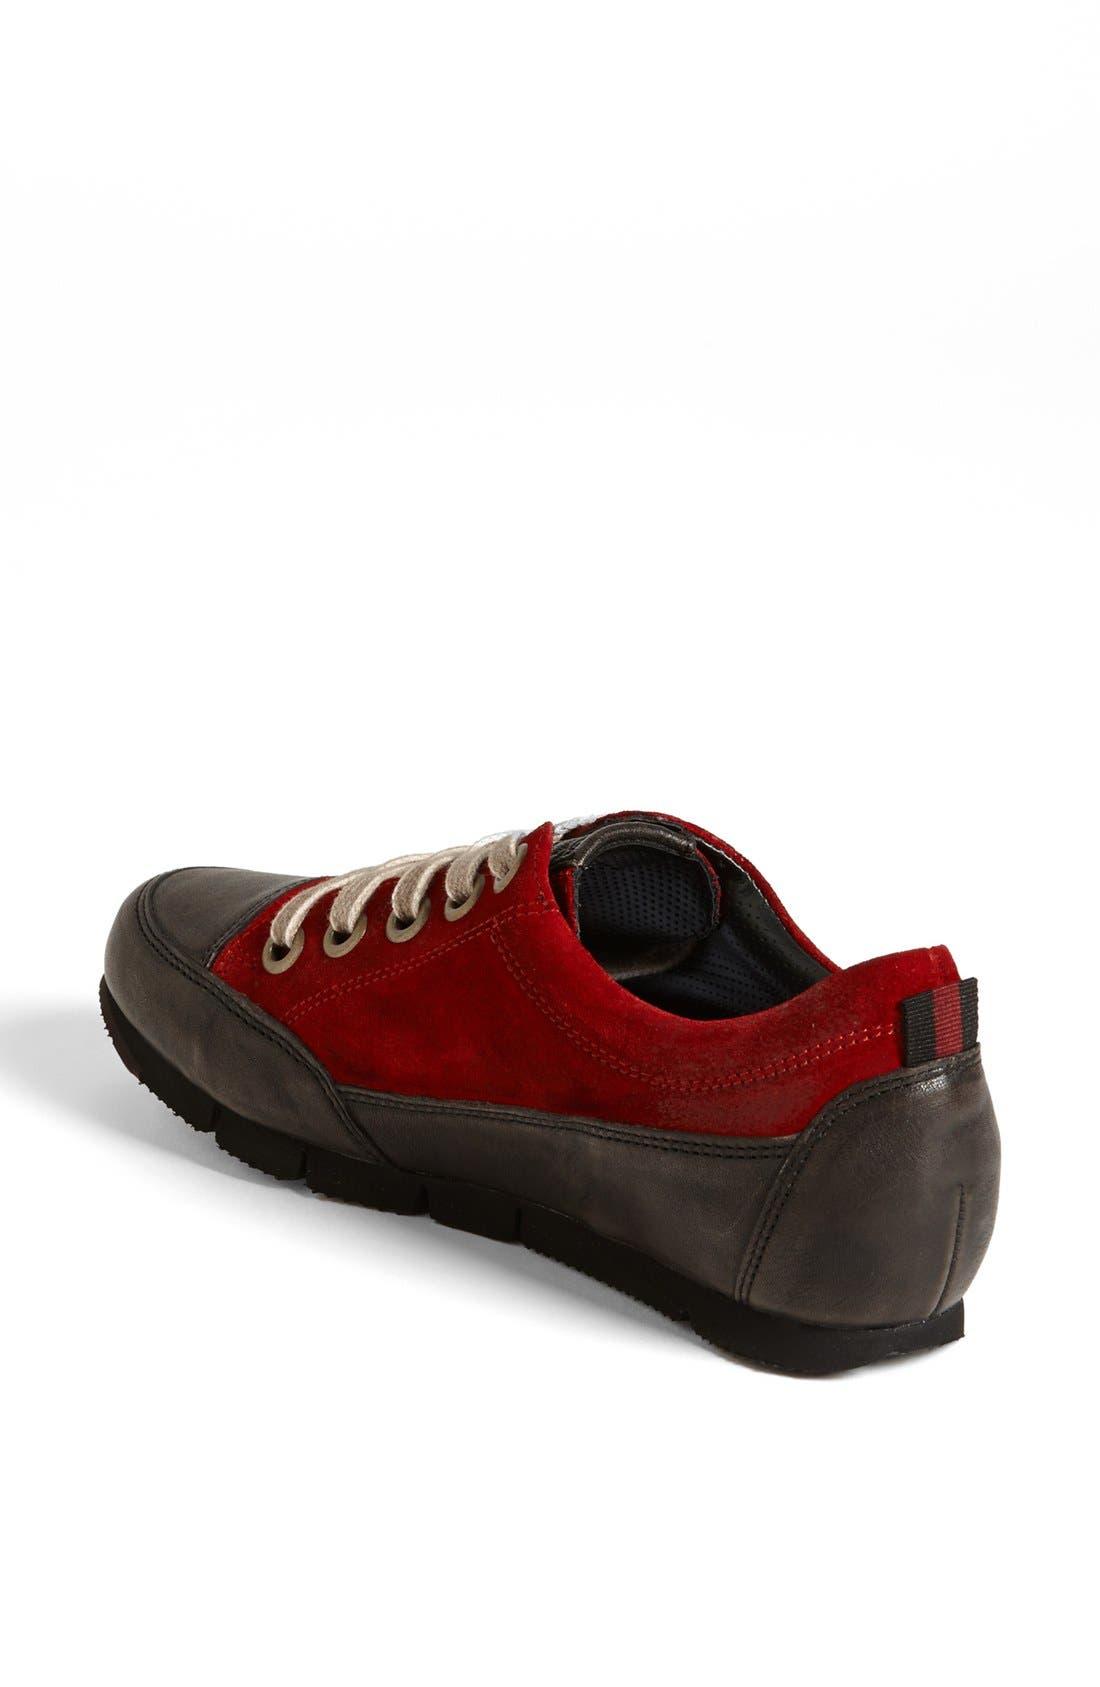 Alternate Image 2  - Paul Green 'Posh' Sneaker